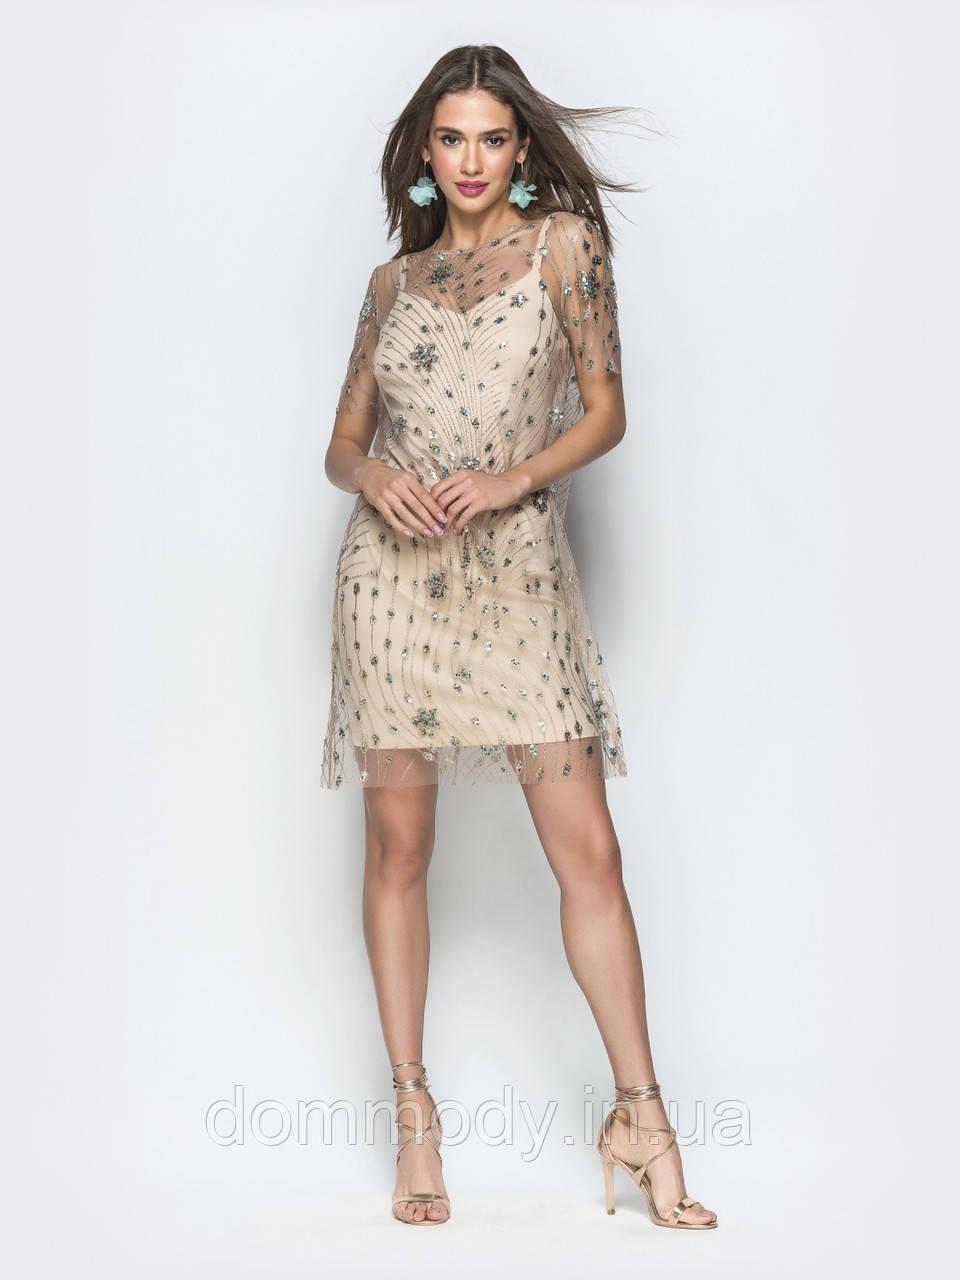 Сукня жіноча Candice turquoise